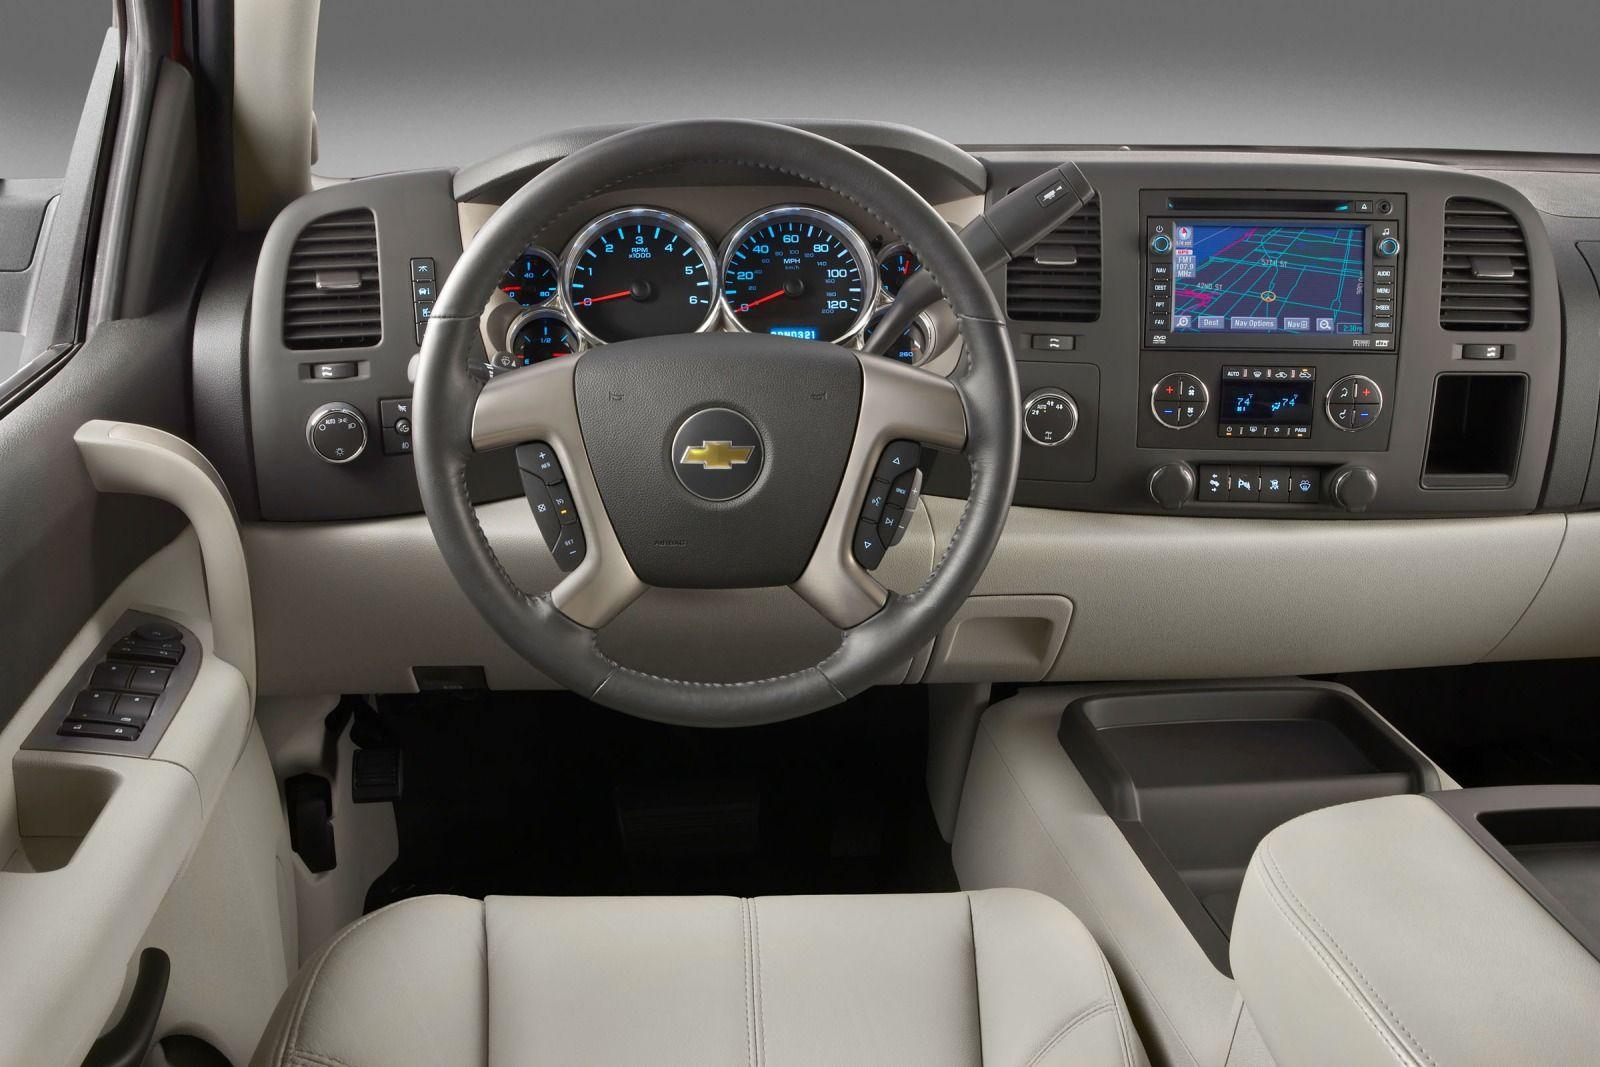 Chevrolet Silverado 3500hd Crew Cab Ltz 2015 Suv Drive